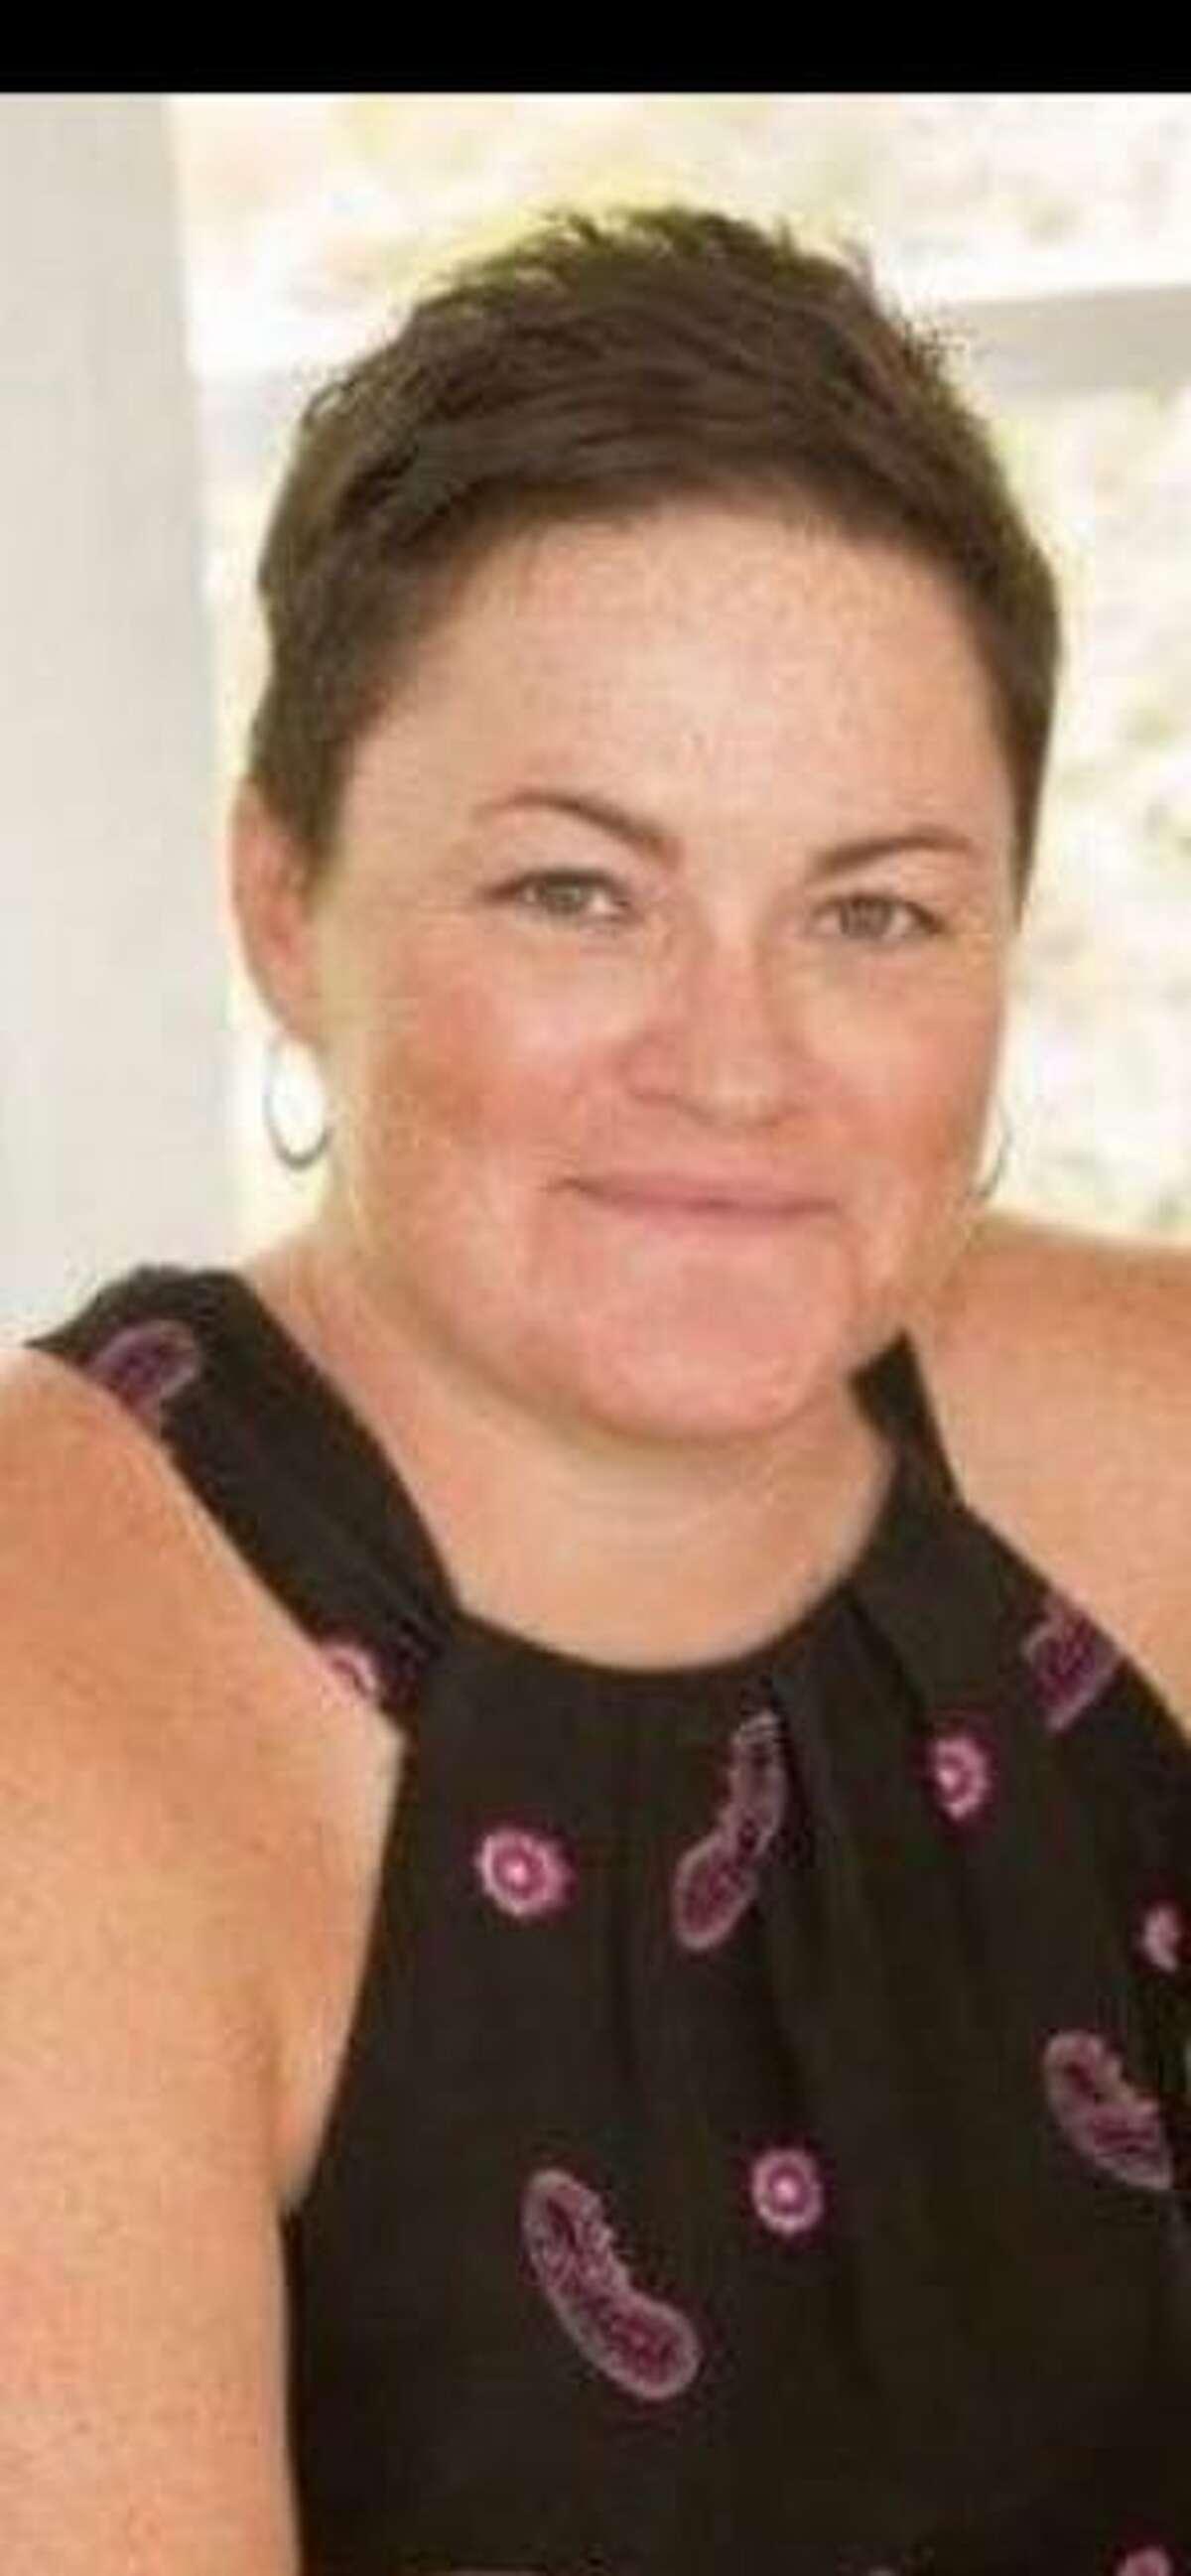 Regina Sullivan is the new Guilford girls soccer coach.